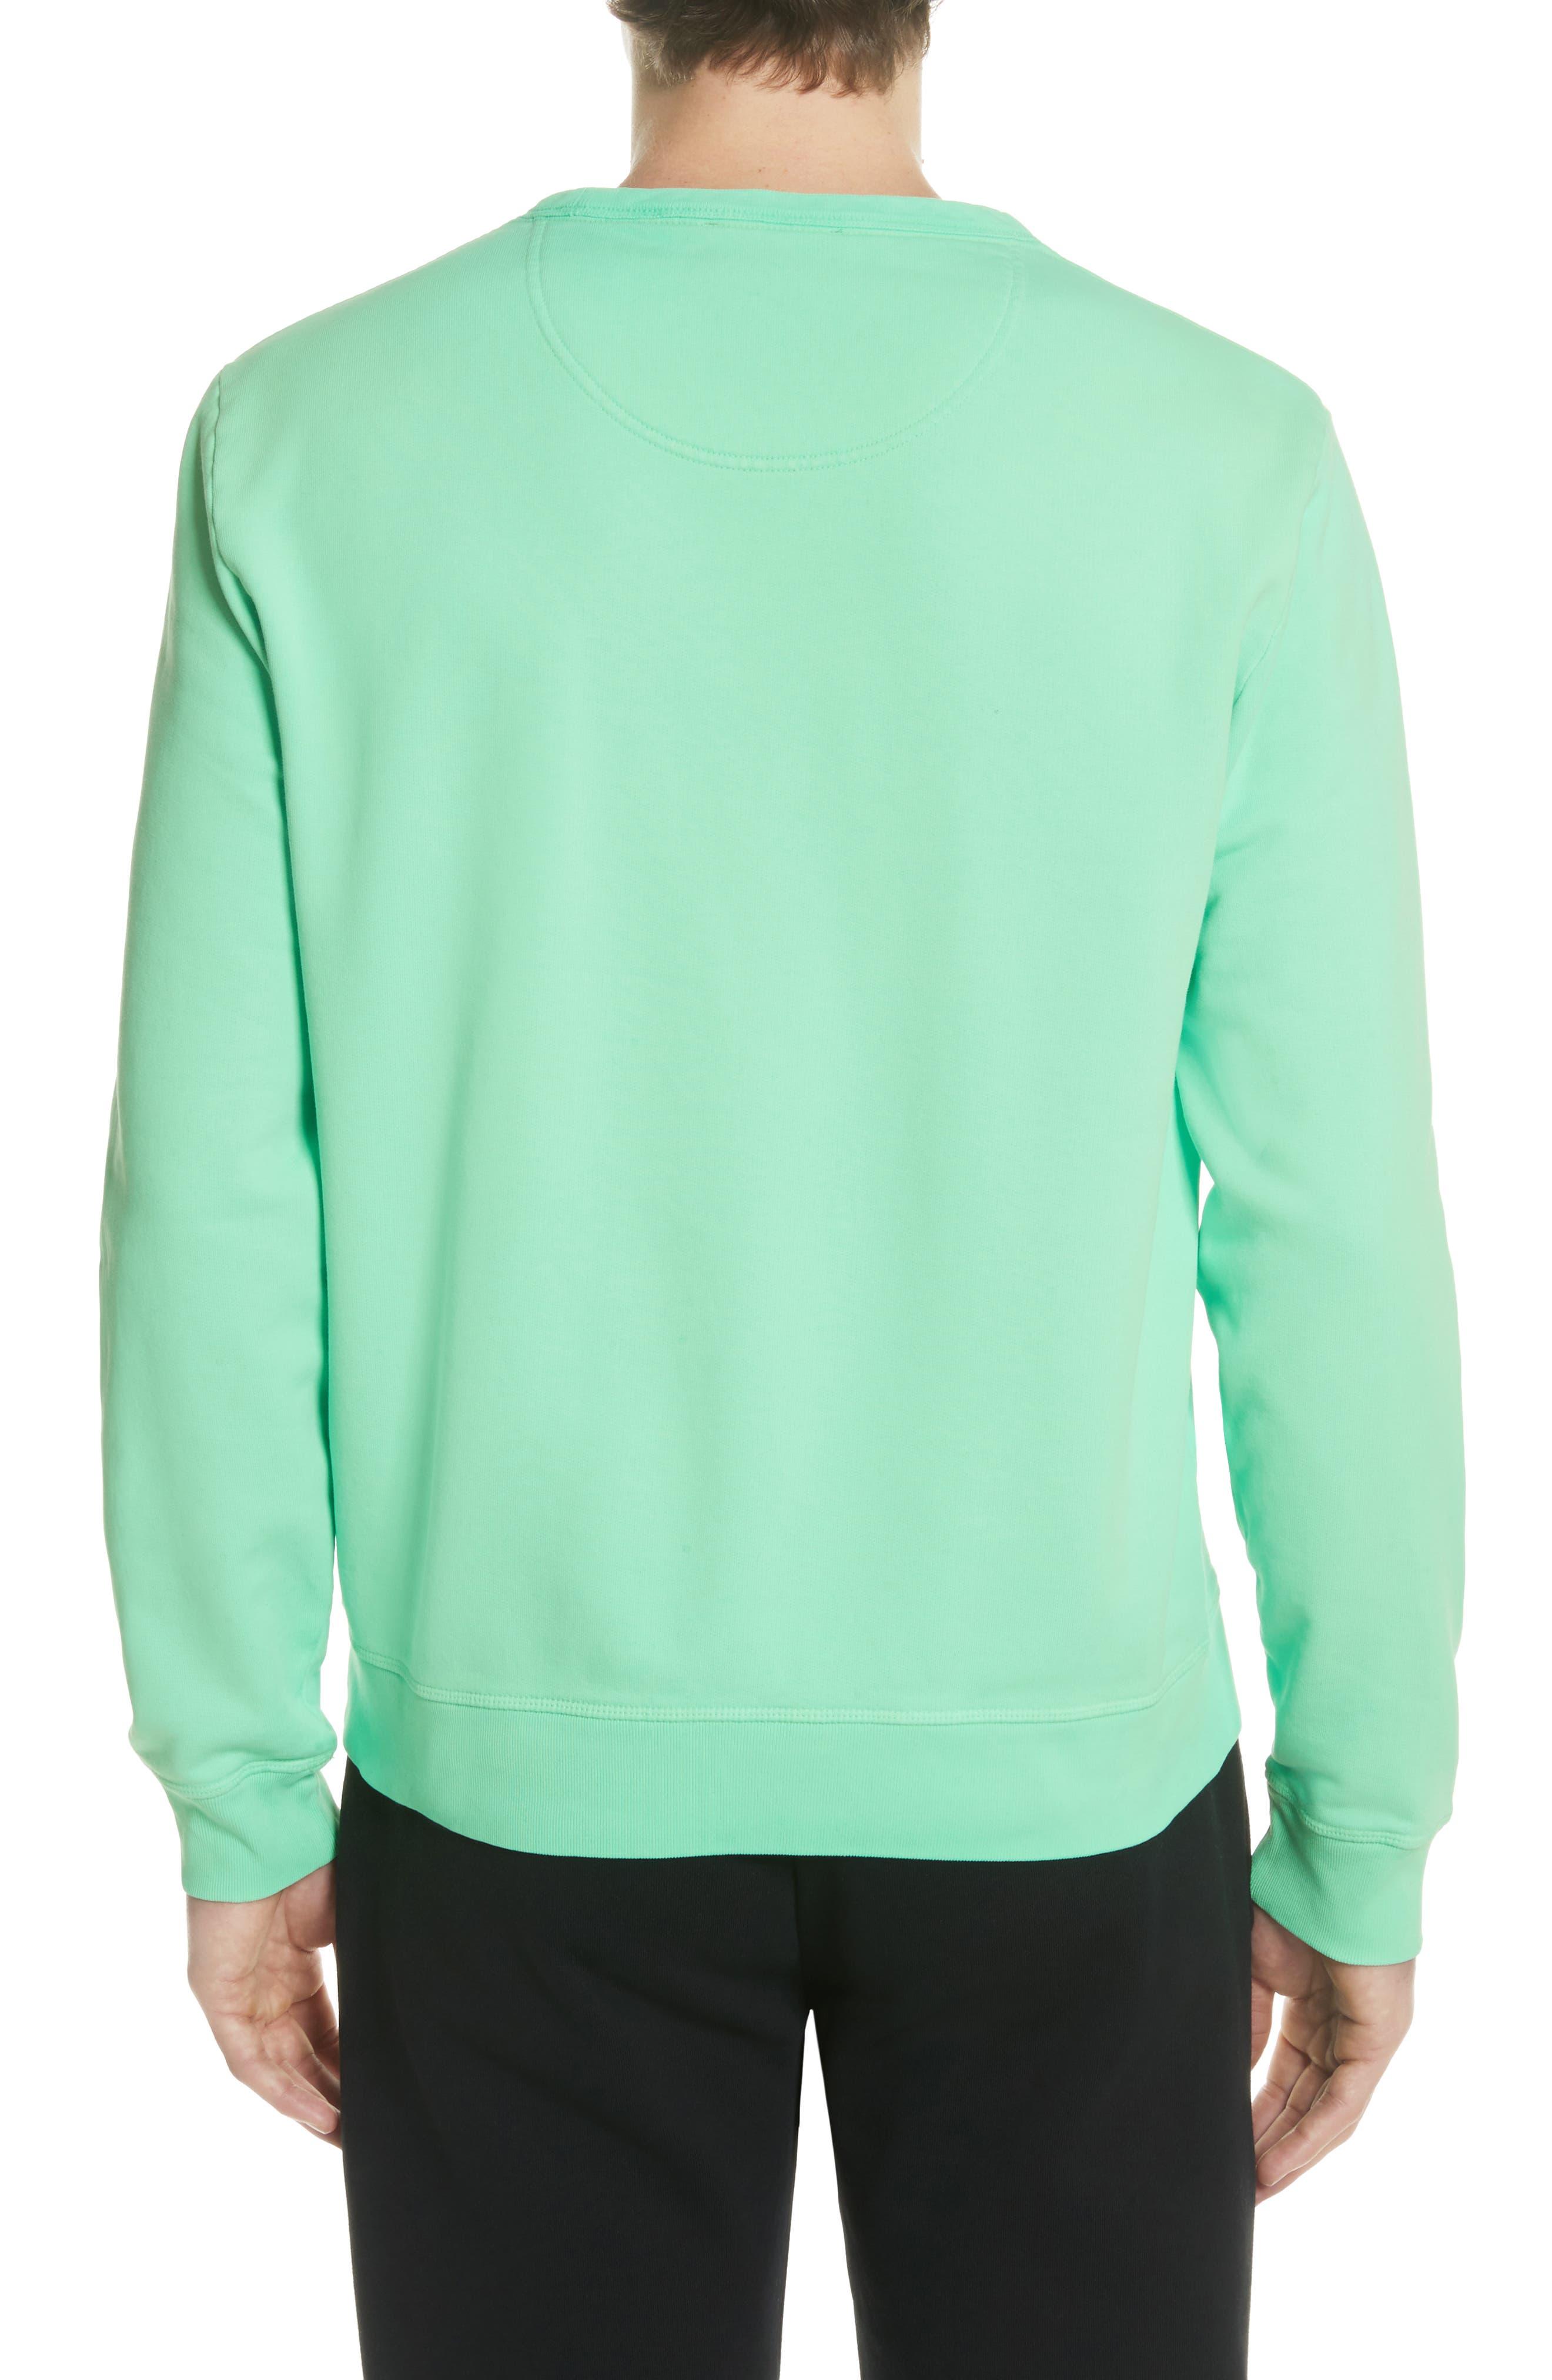 Madon Graphic Sweatshirt,                             Alternate thumbnail 2, color,                             300